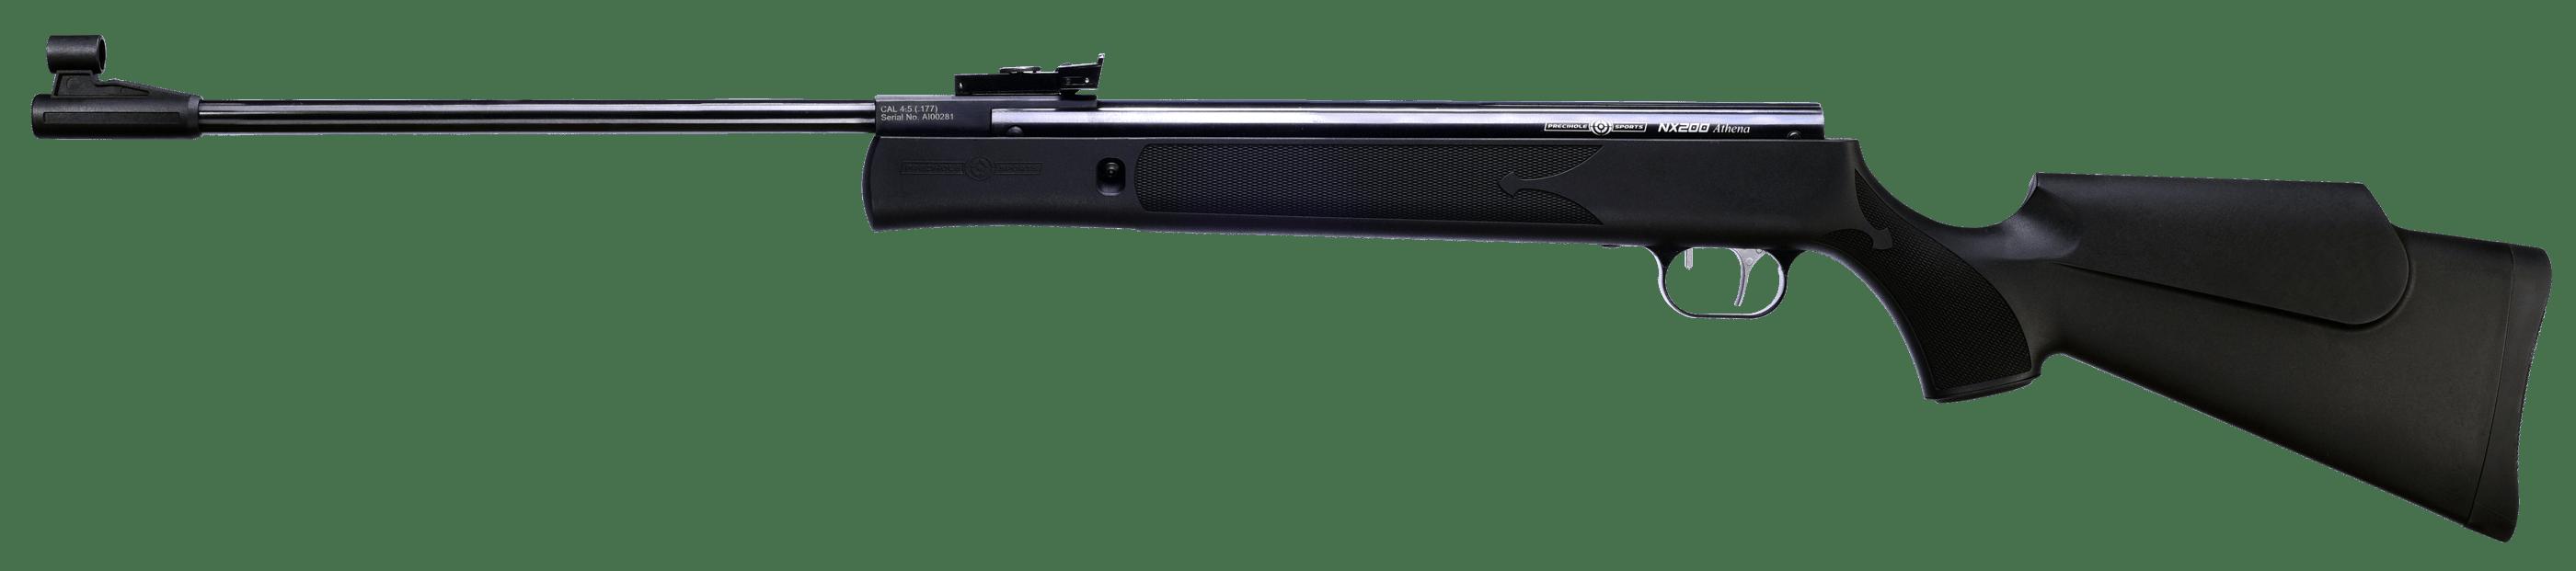 NX200 Athena